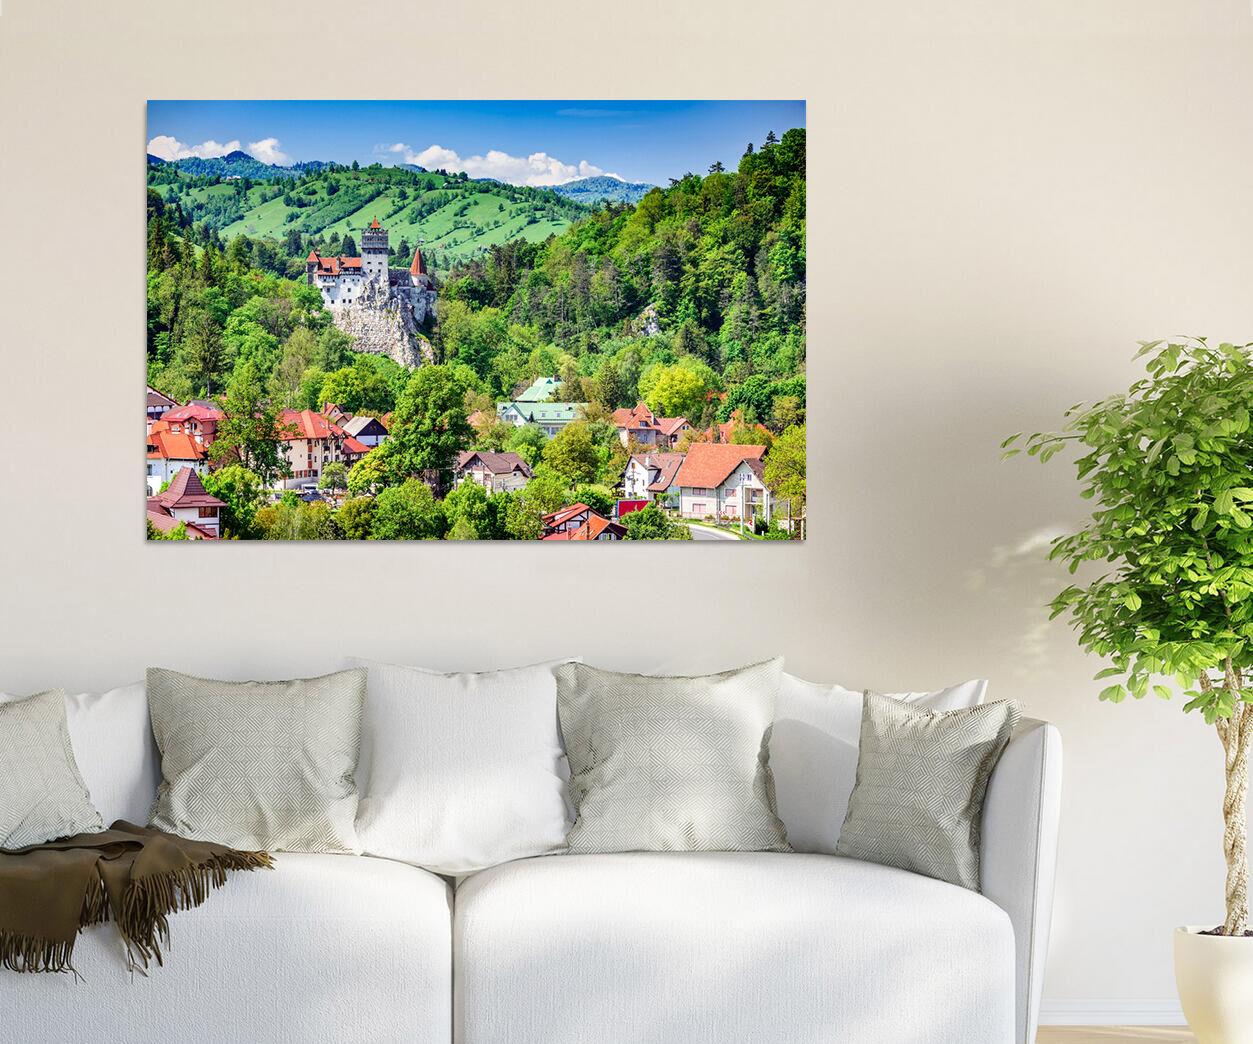 3D Grne Berge, Huser 7443 Fototapeten Wandbild BildTapete Familie AJSTORE DE